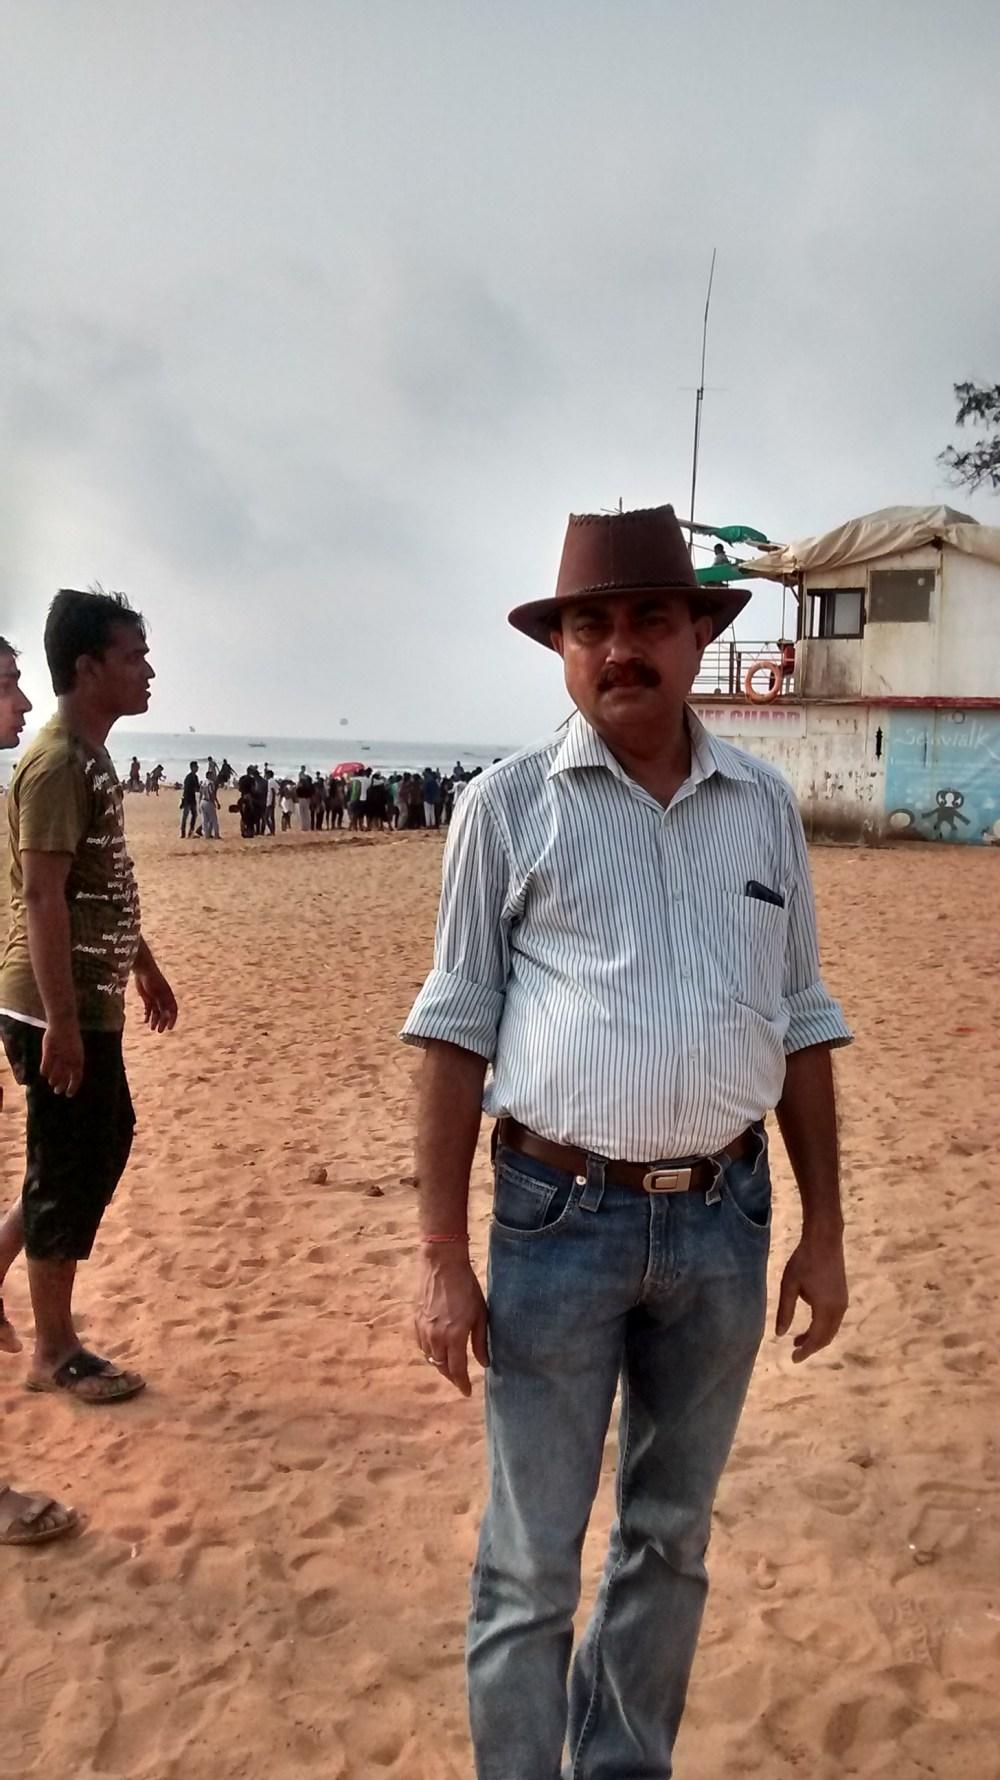 Baga Beach, Goa. India. Goa is famous for it's beaches